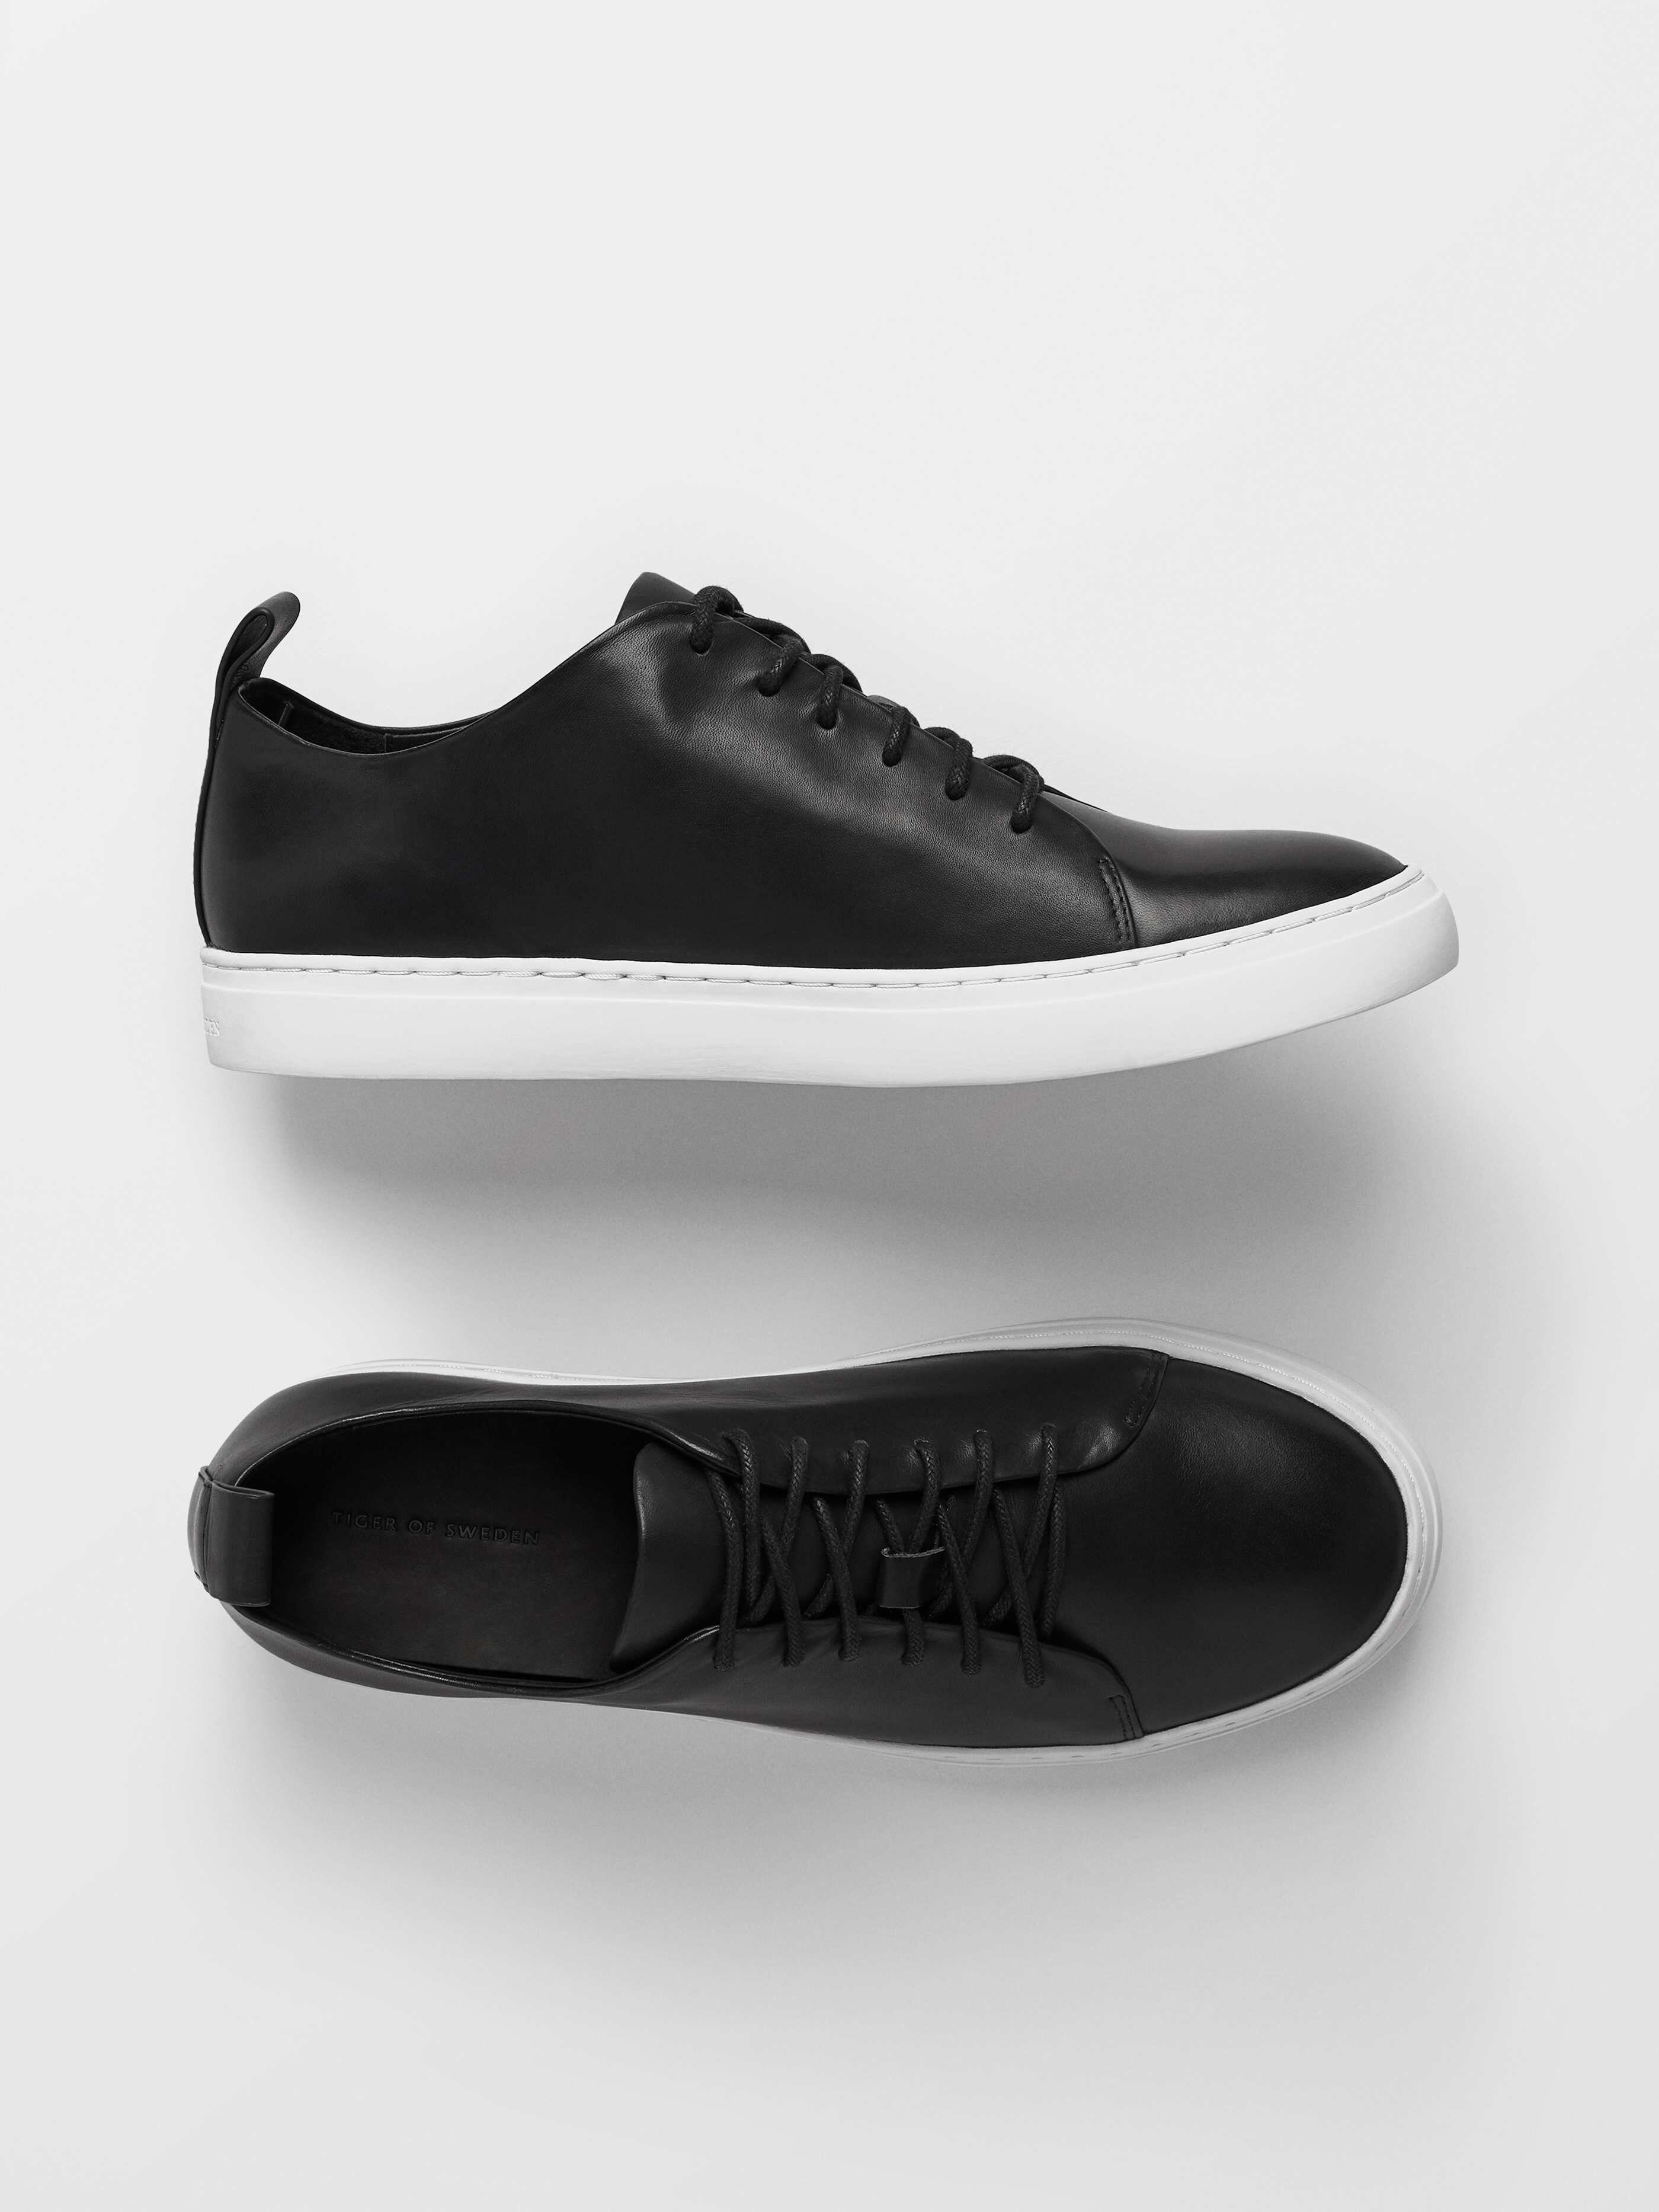 Brukare Sneaker - Schuhe Online kaufen